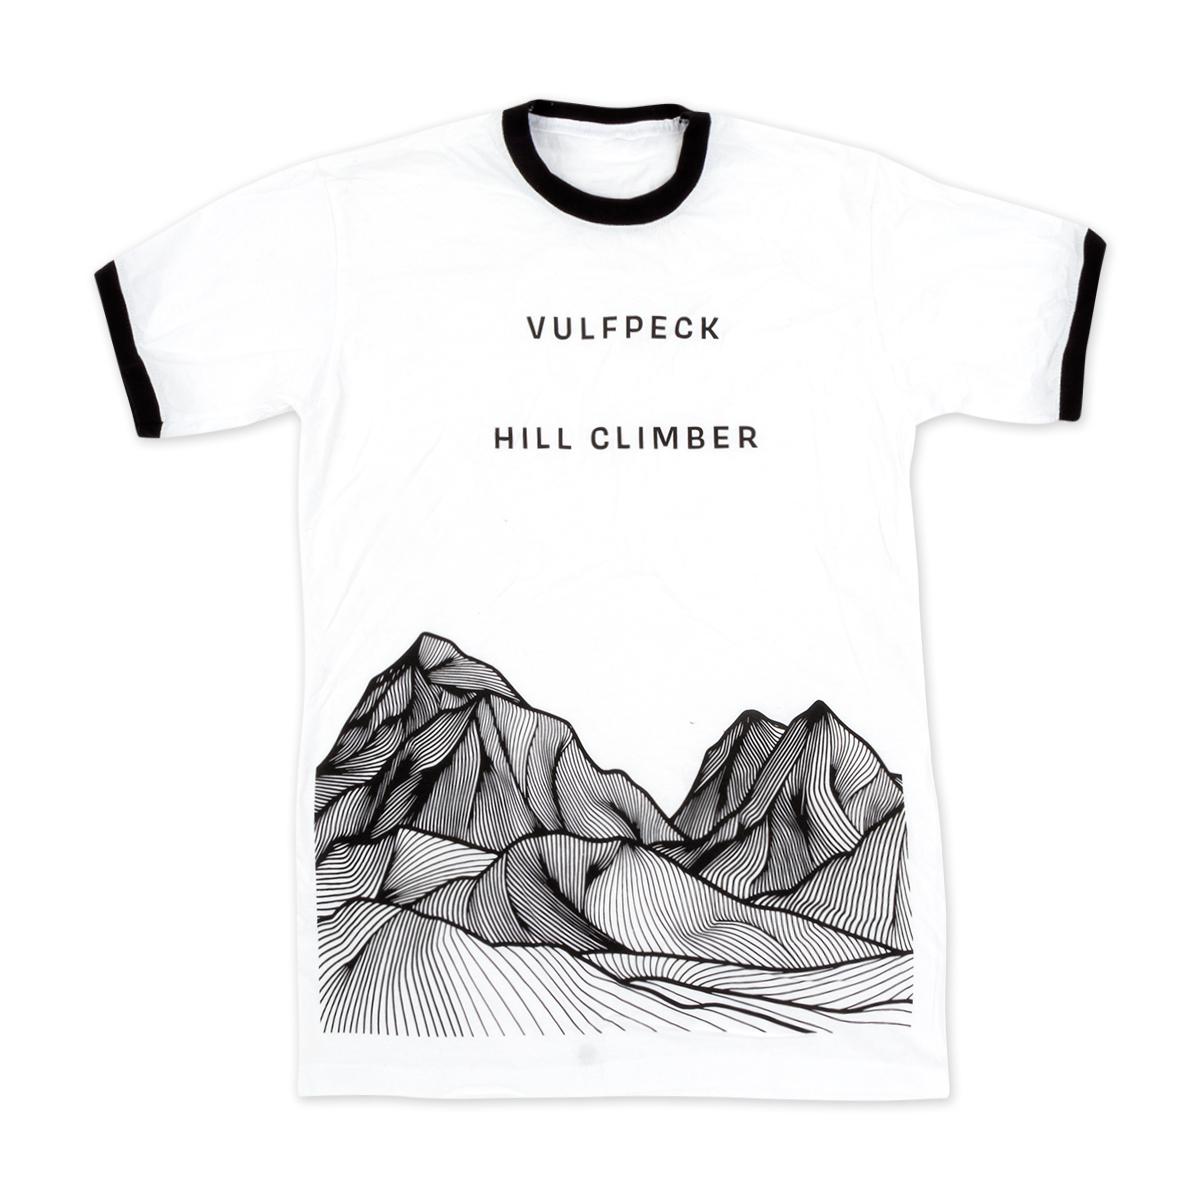 Vulfpeck Hill Climber Tee